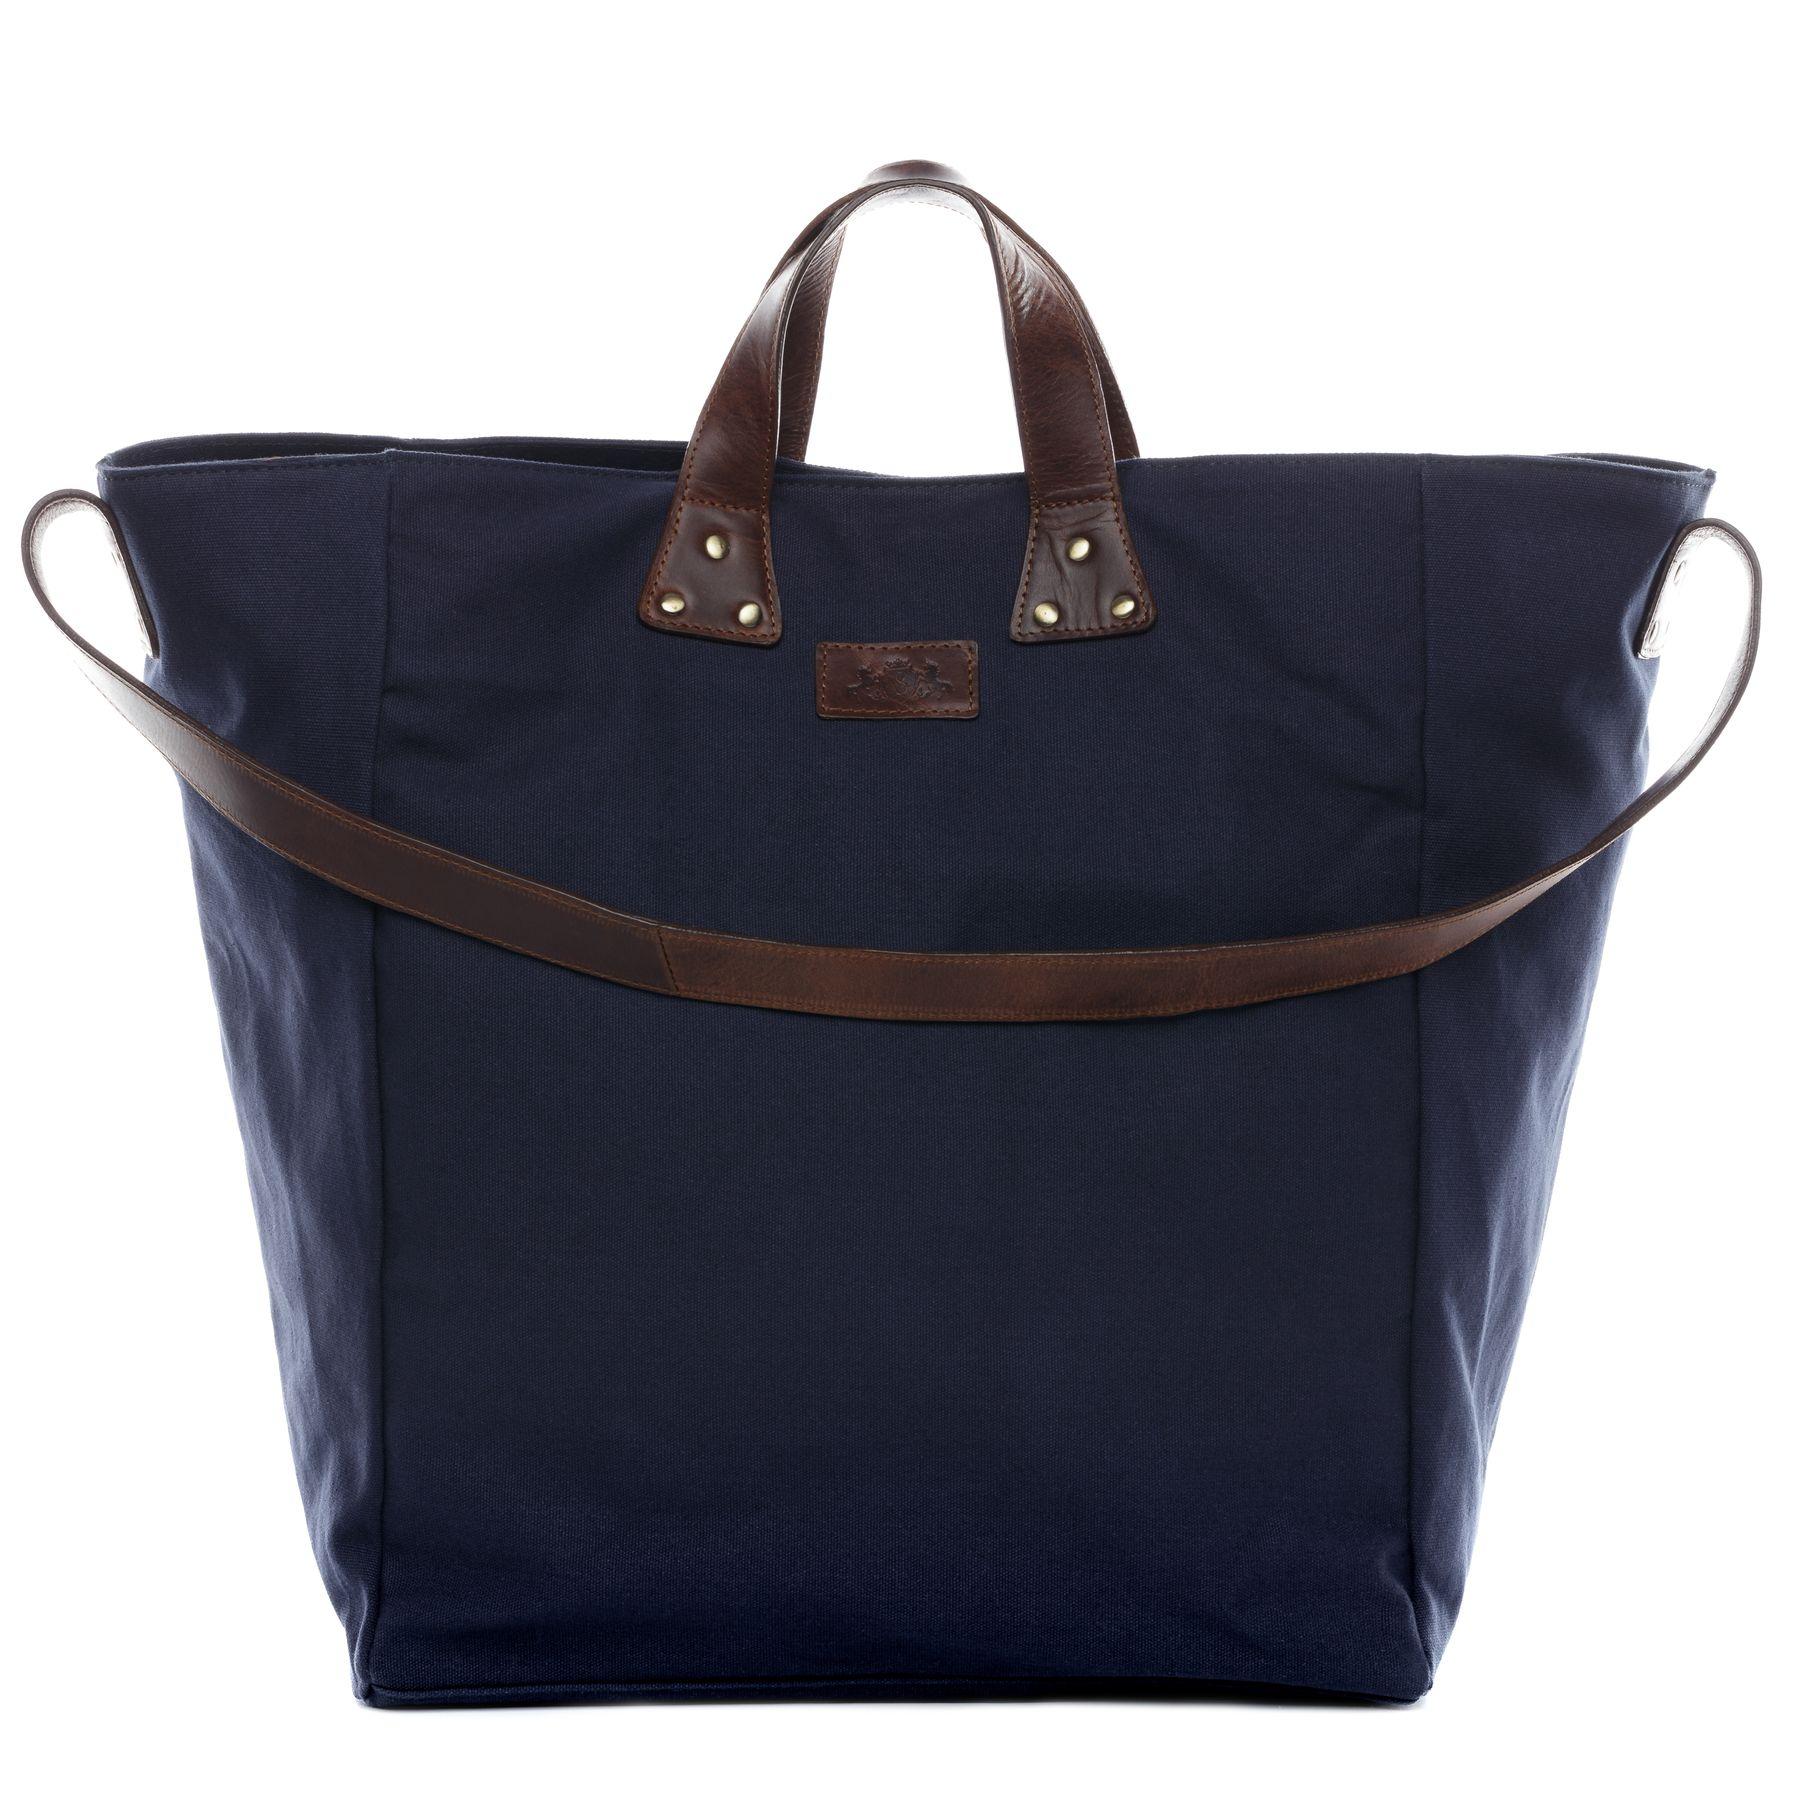 7066ea6a10 SID & VAIN shoulder bag & cross-body bag Smooth Leather ABERDEEN ...